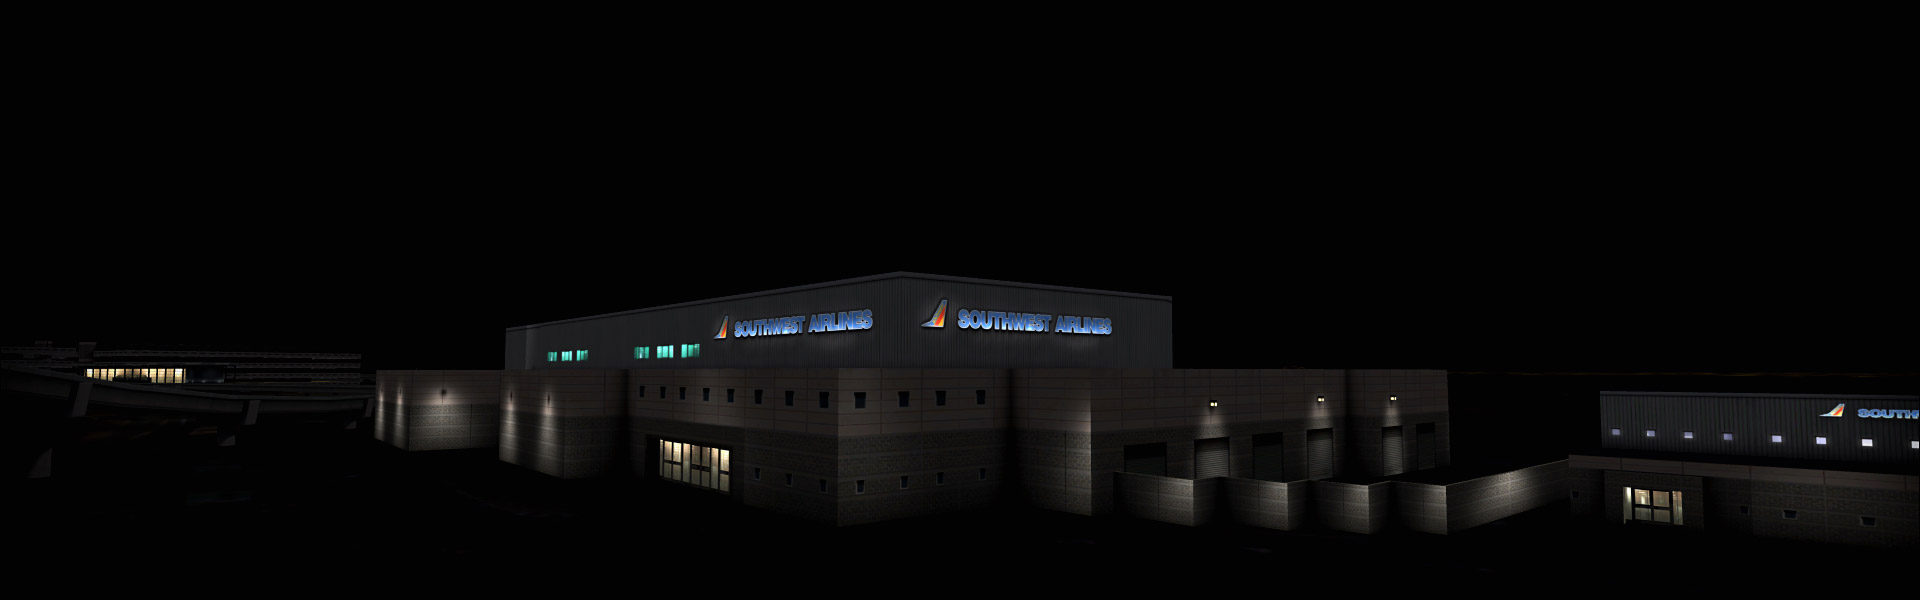 KPHX Phoenix - Flightbeam - review (5*) • C-Aviation